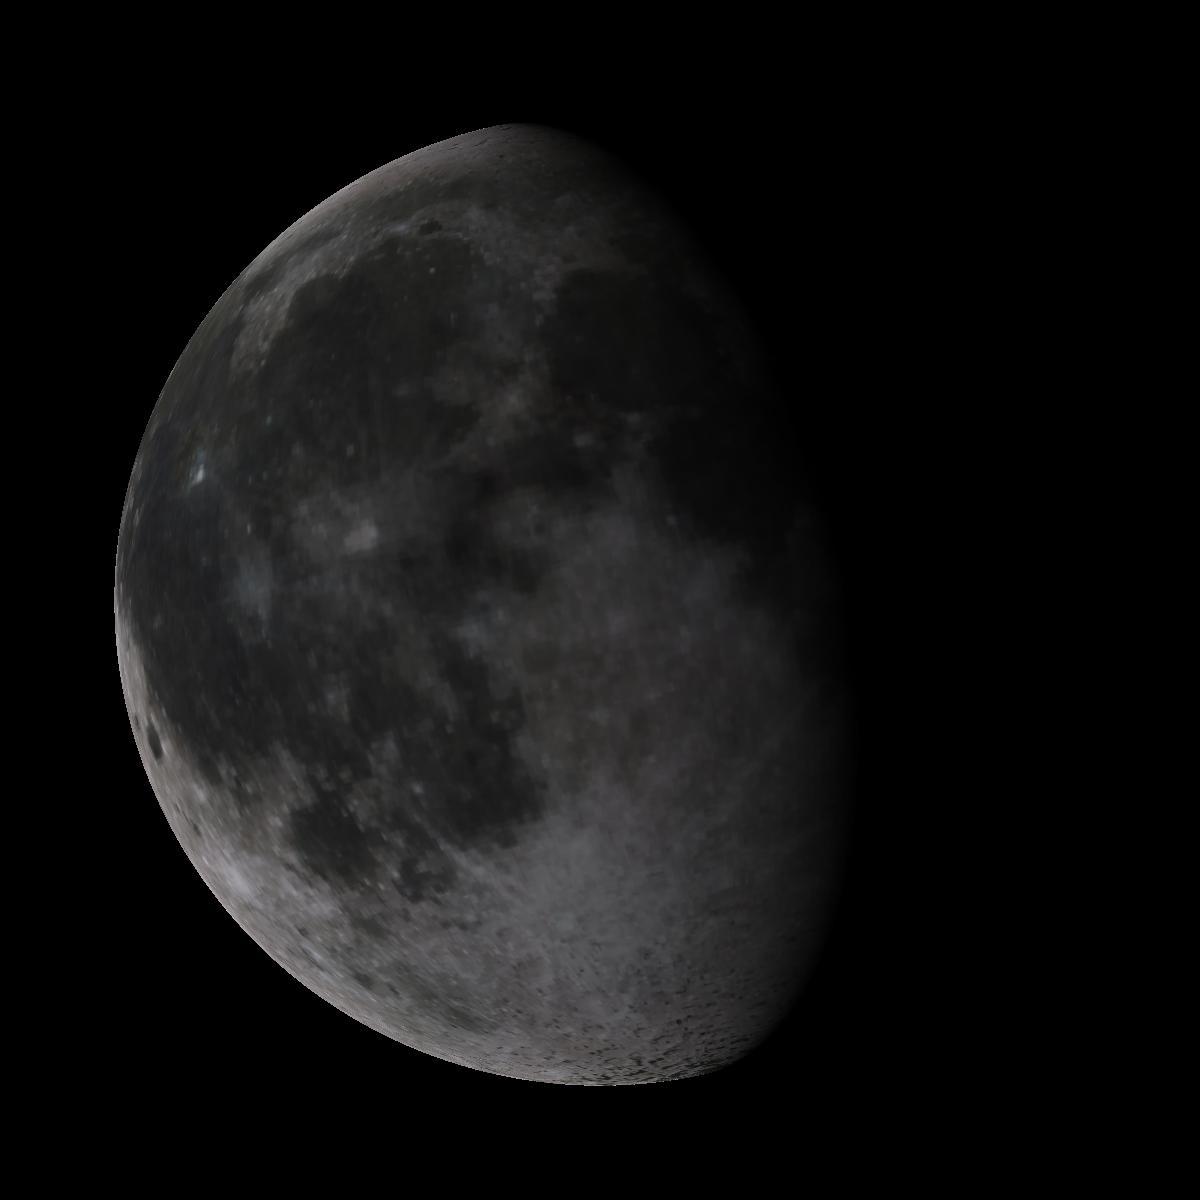 Lune du 14 mars 2020